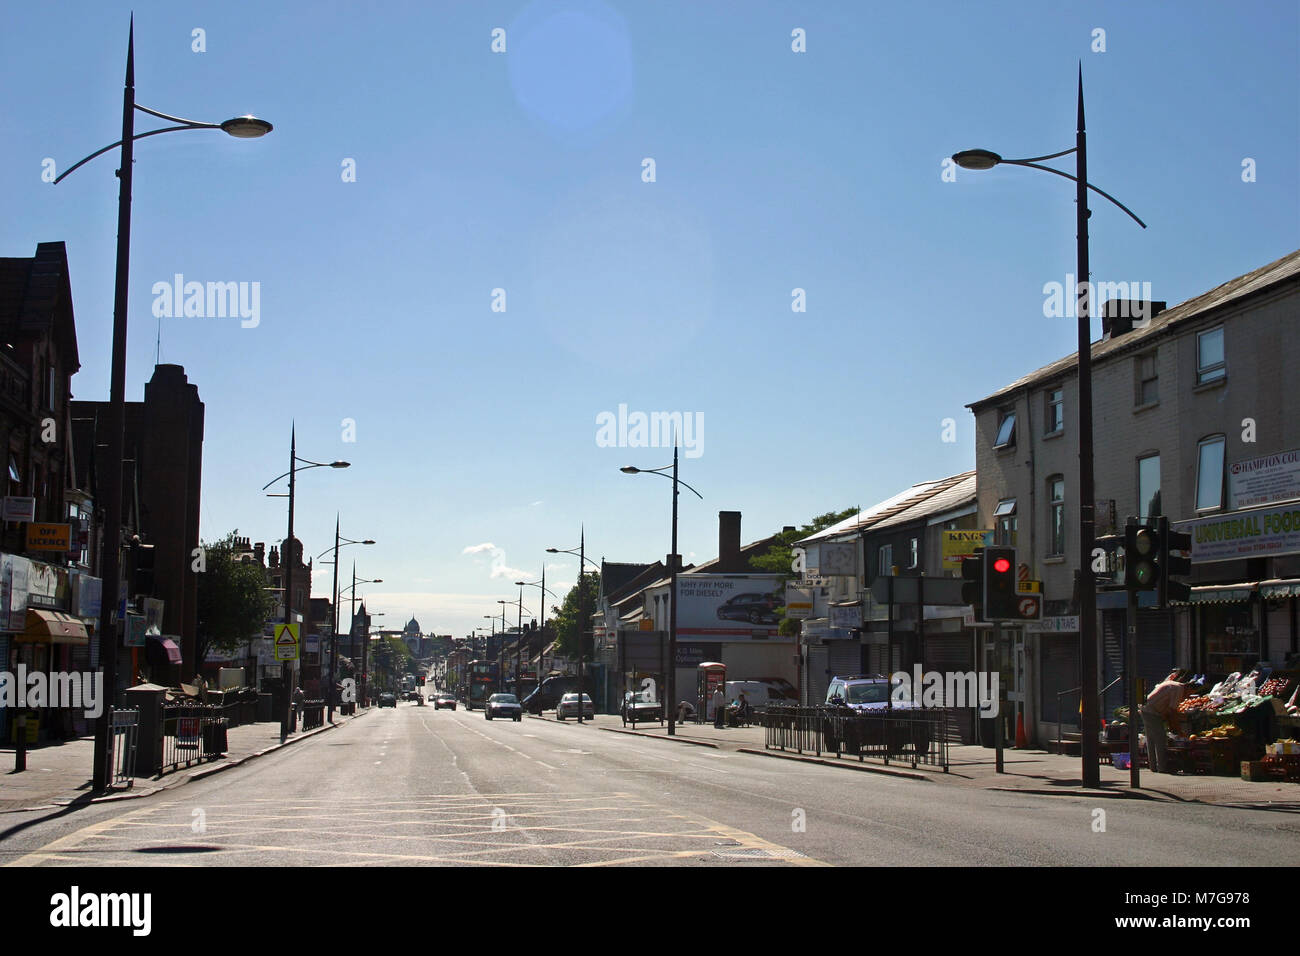 Soho Road, Birmingham - Stock Image